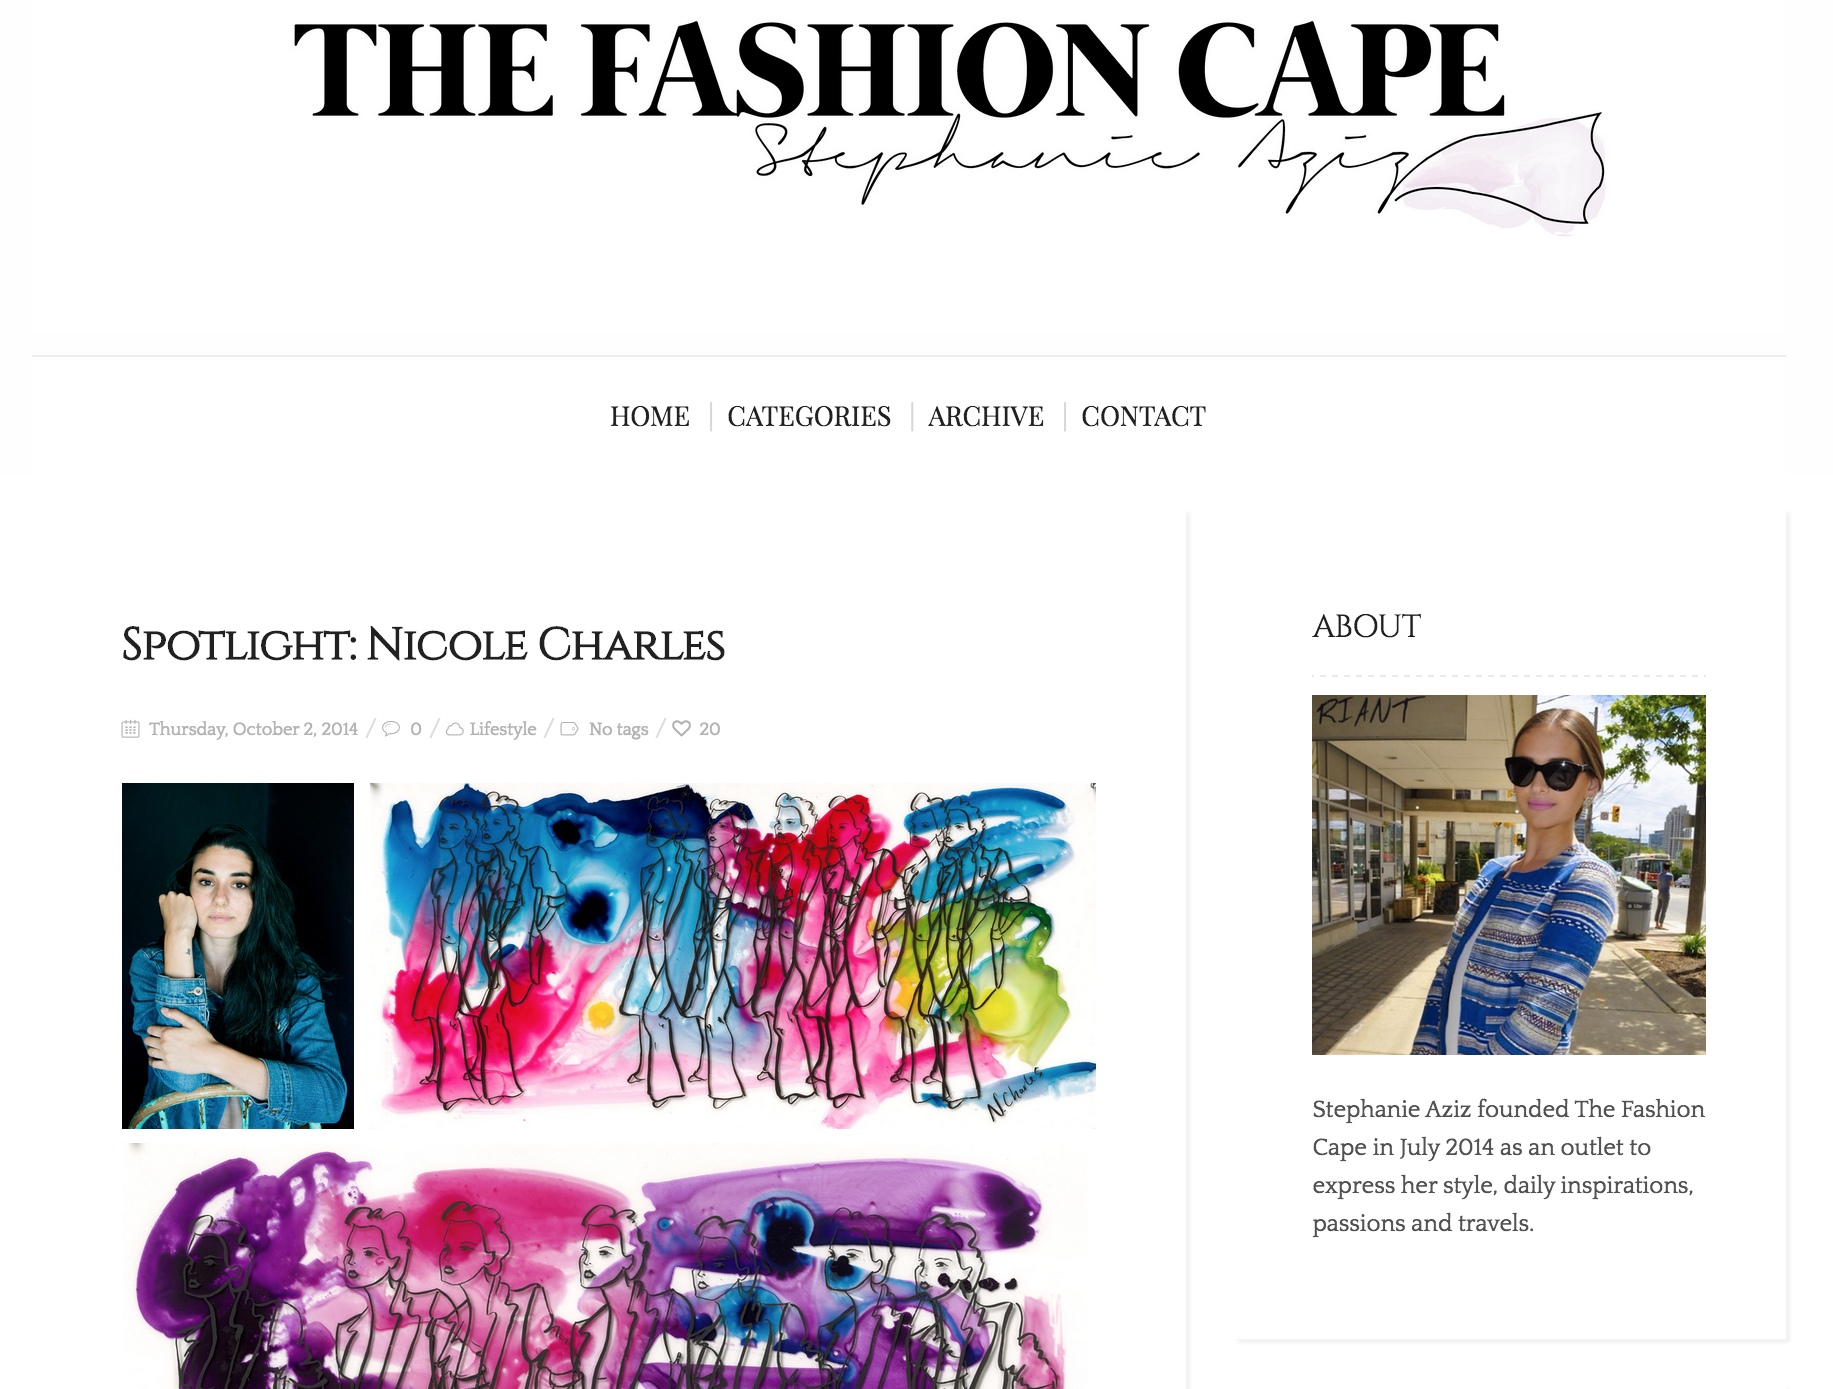 The Fashion Cape, 2014 (1/2)